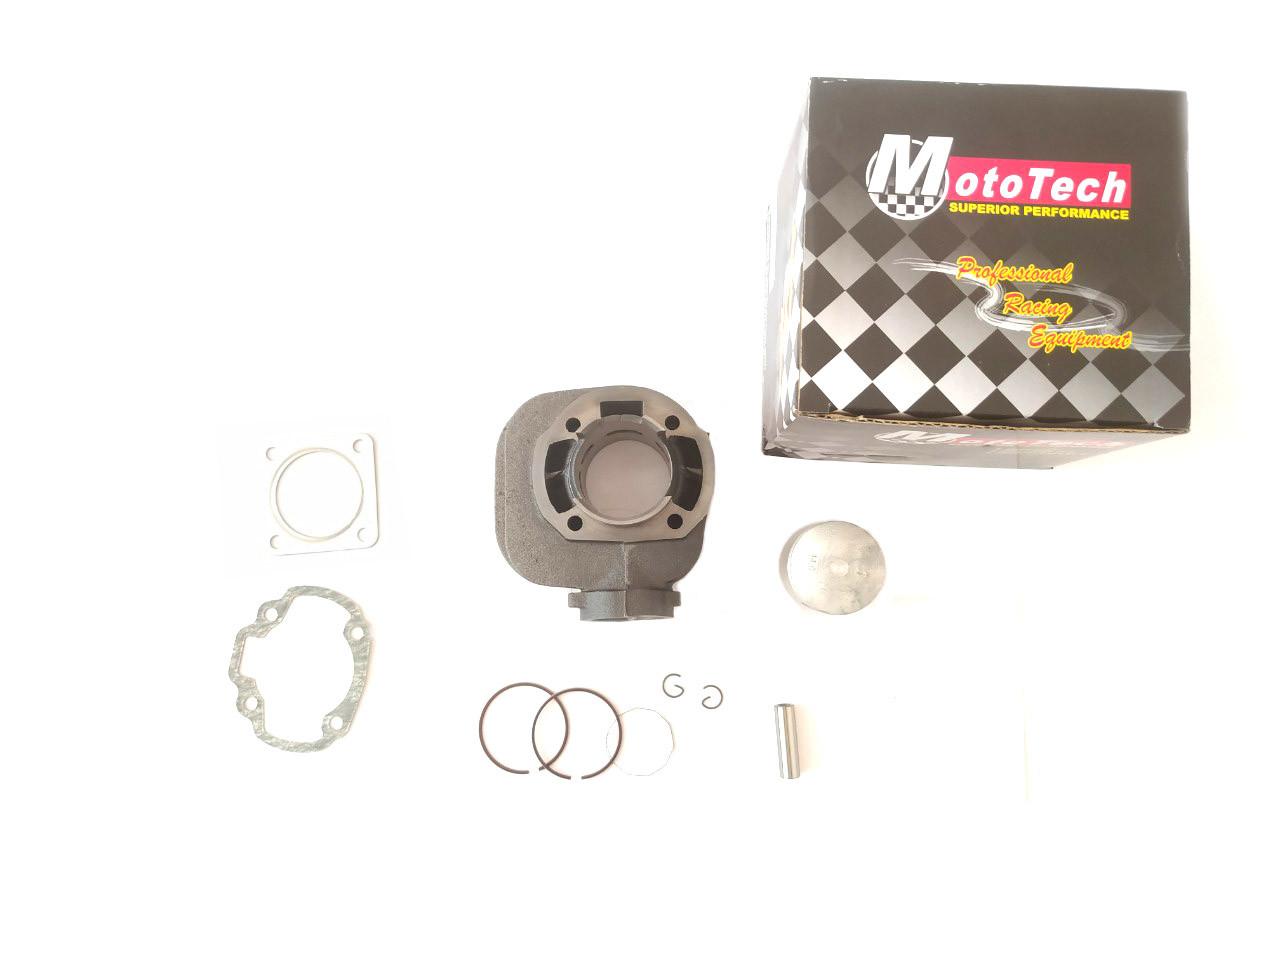 Поршневая (ЦПГ) SUZUKI LETS (41mm/49.9cc) Mototech